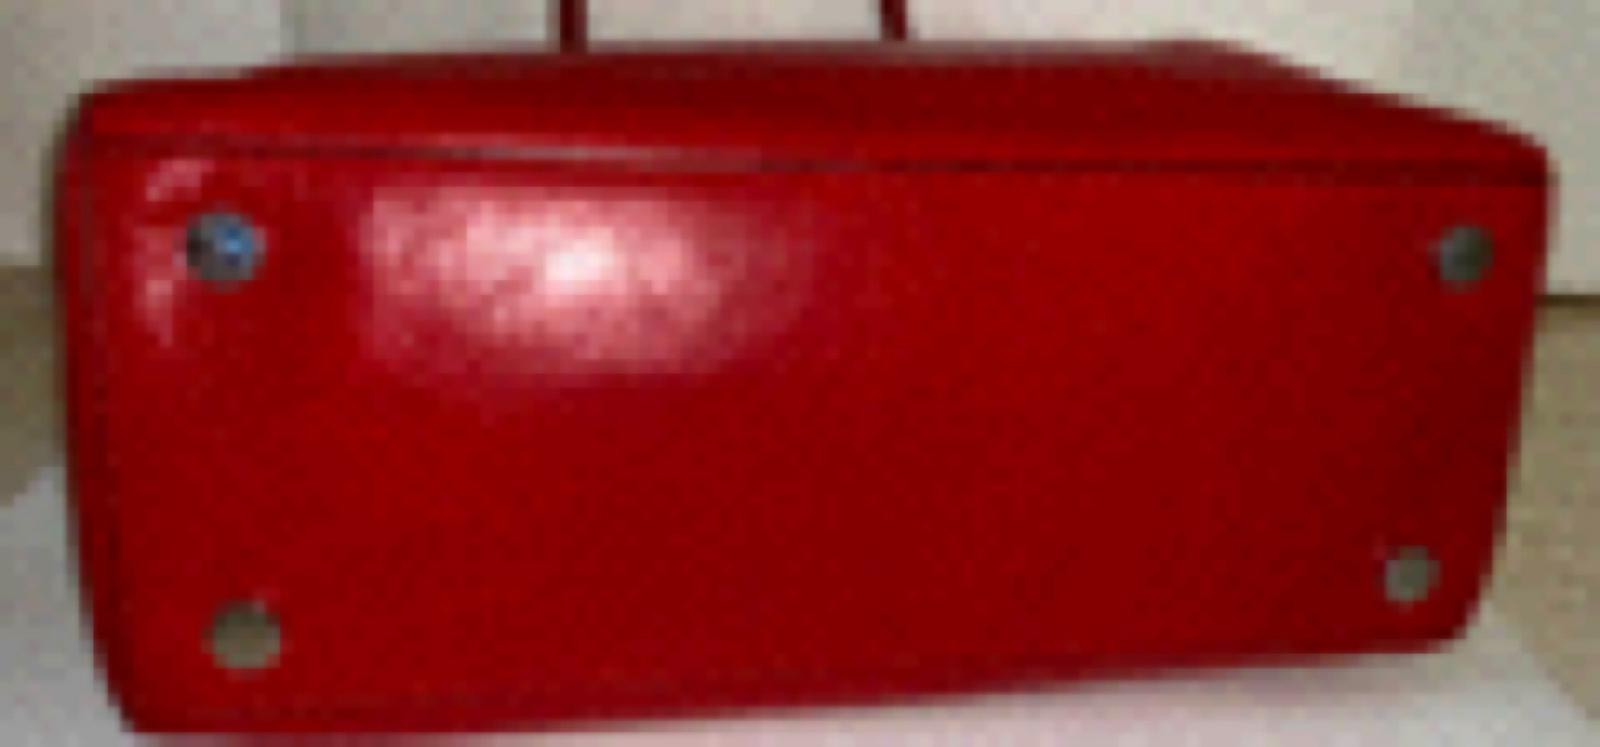 Michael Kors Bedford Red Leather Bag